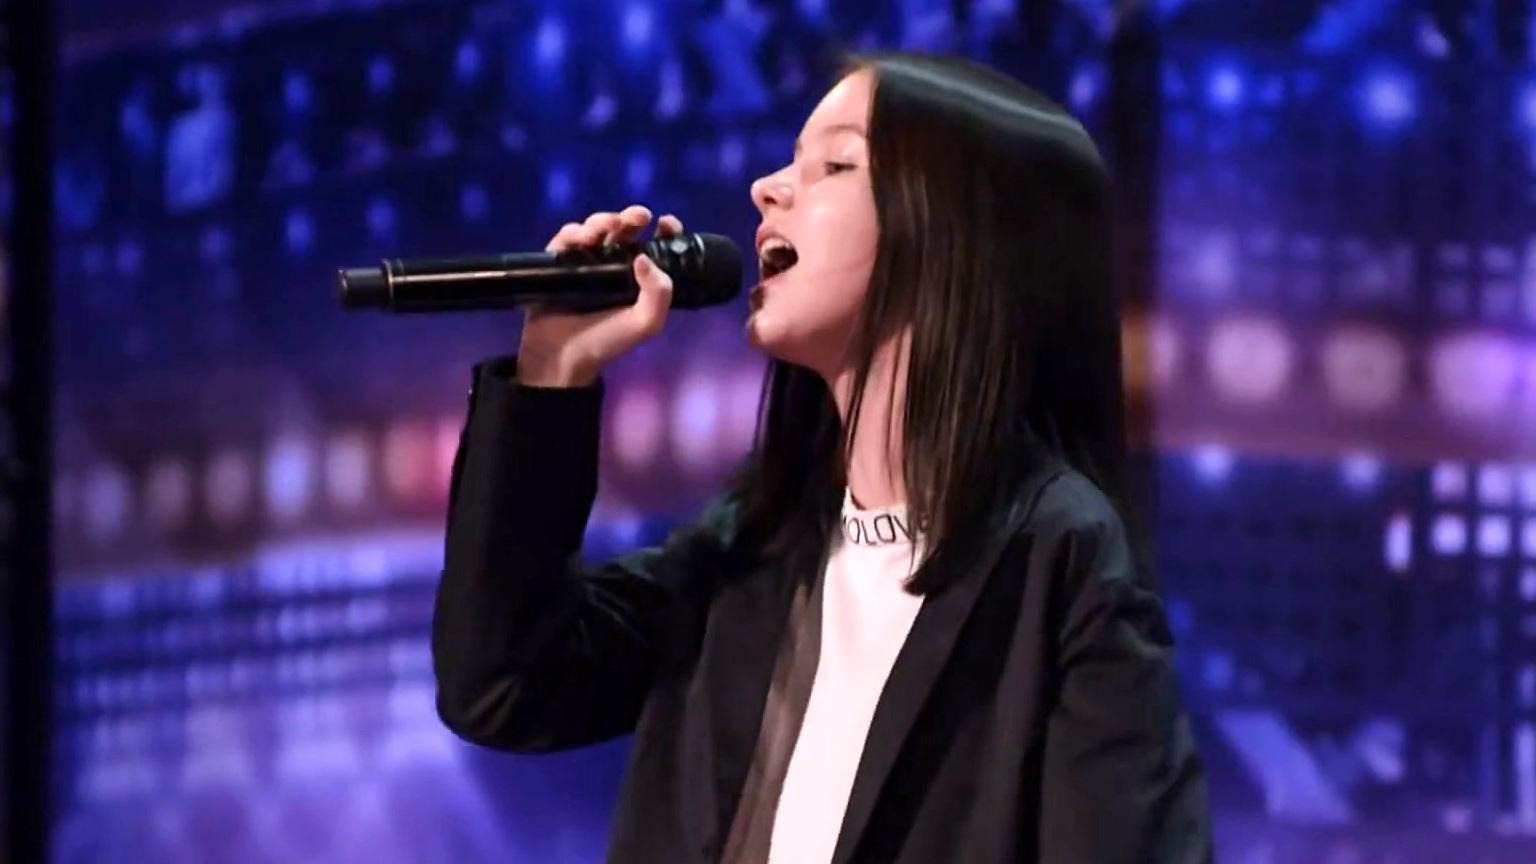 America's Got Talent: Daneliya Tuleshova And Kenadi Dodds Send Love To Their Supporters